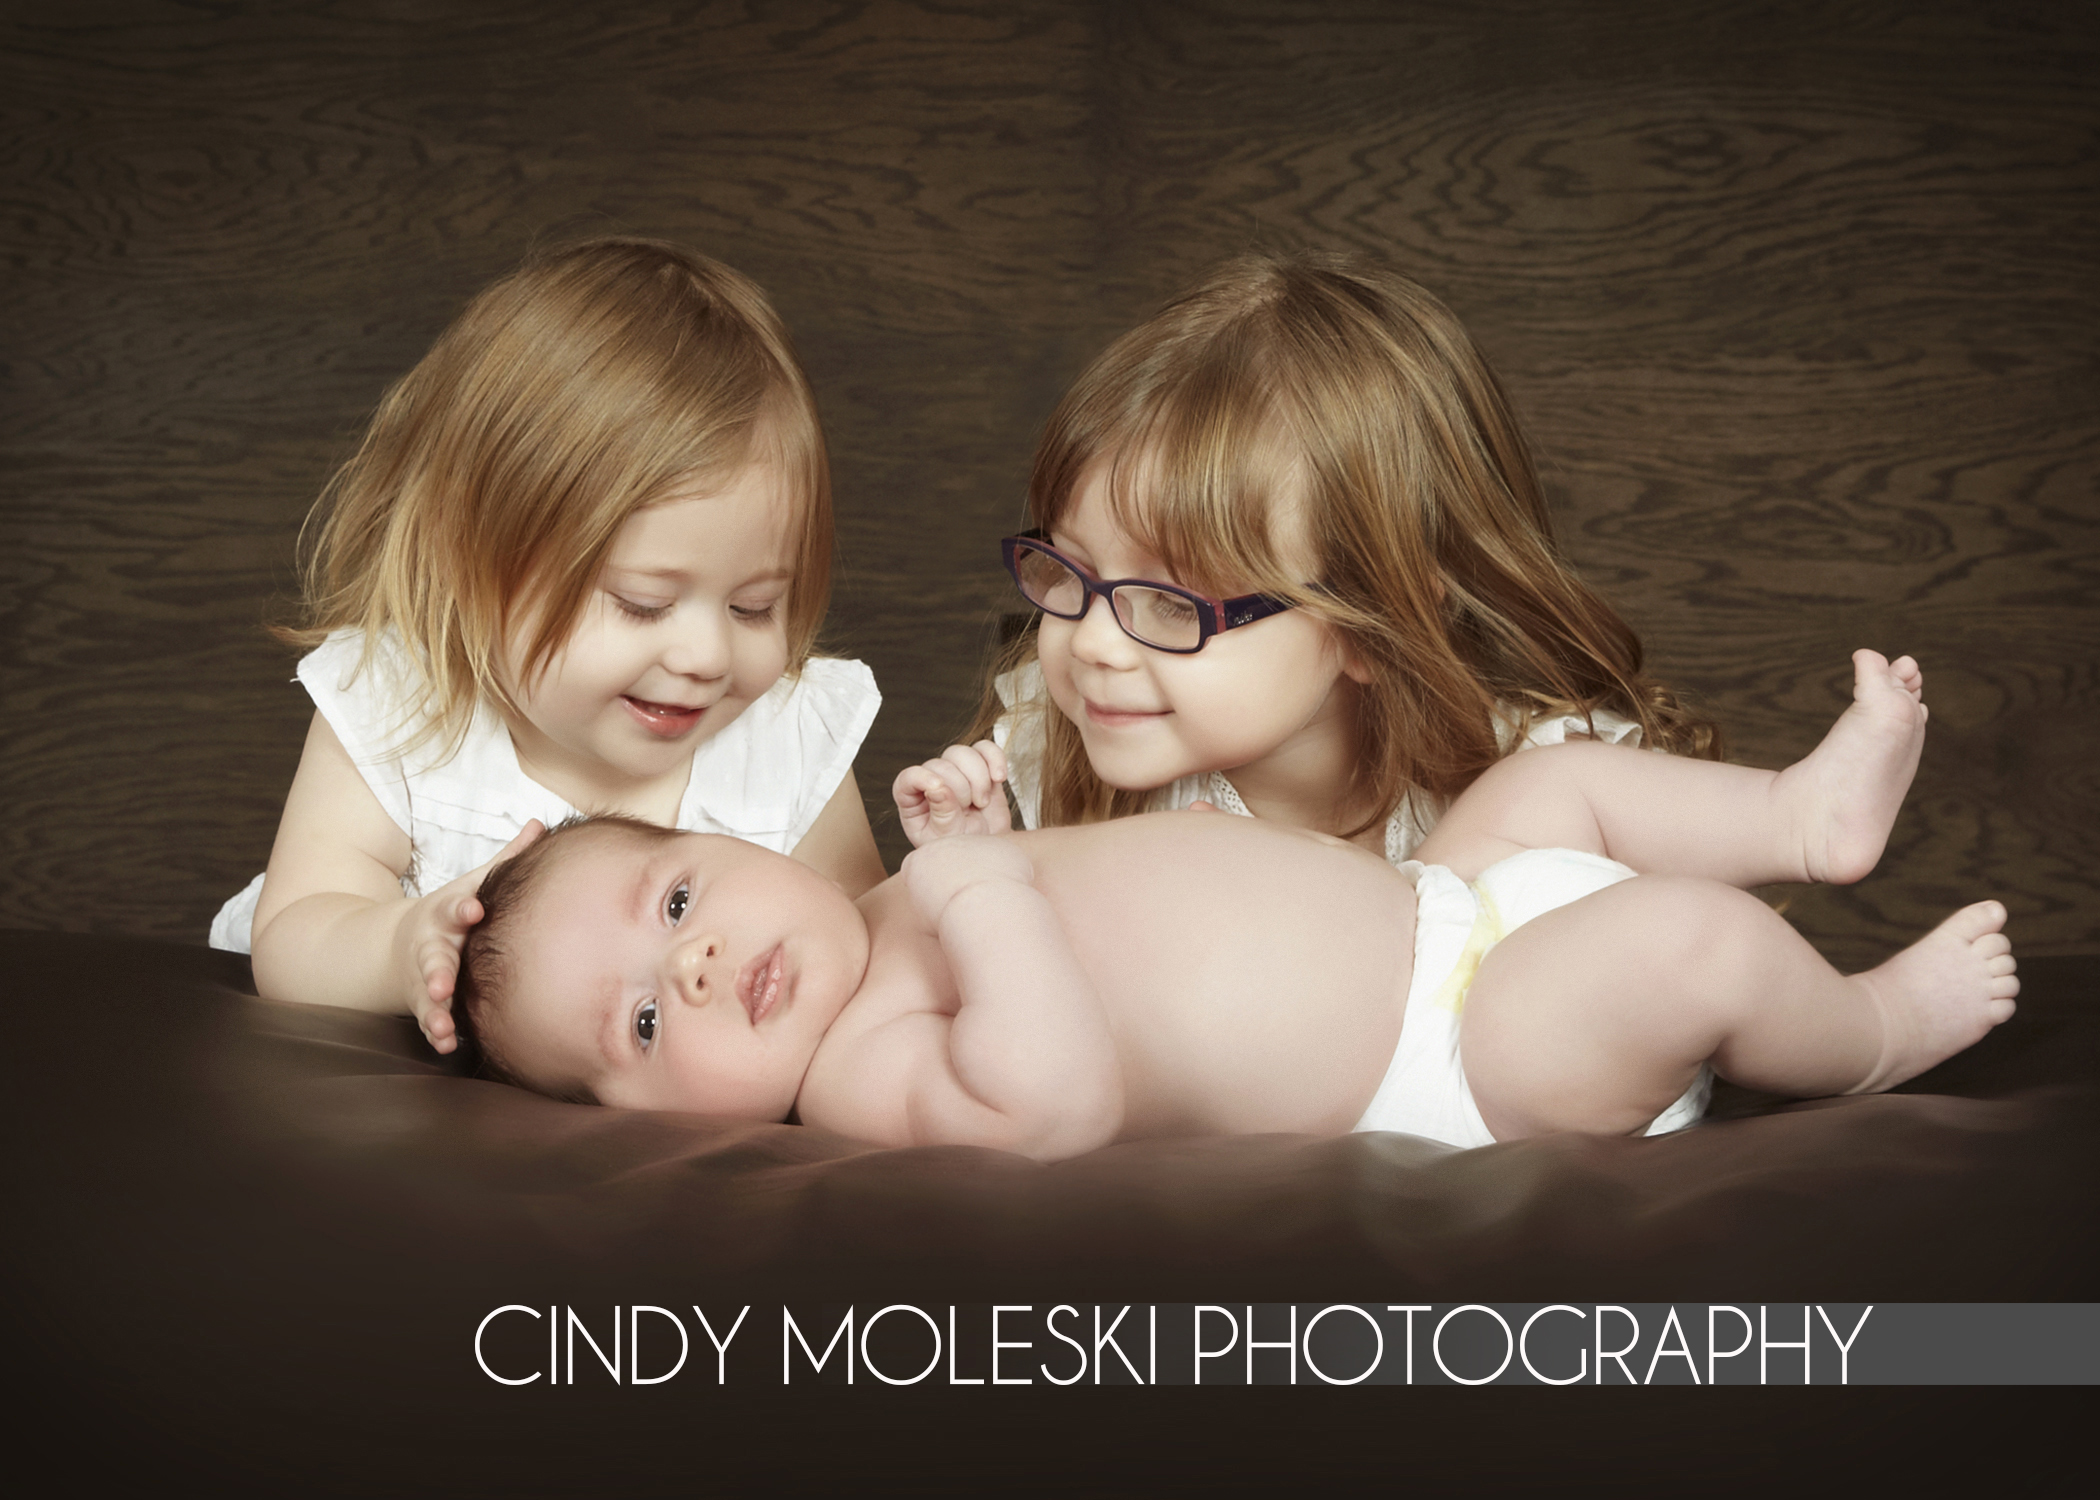 Newborn, siblings, family, cindy moleski, professional photography, saskatoon, saskatchewan 3647- 28463.jpg